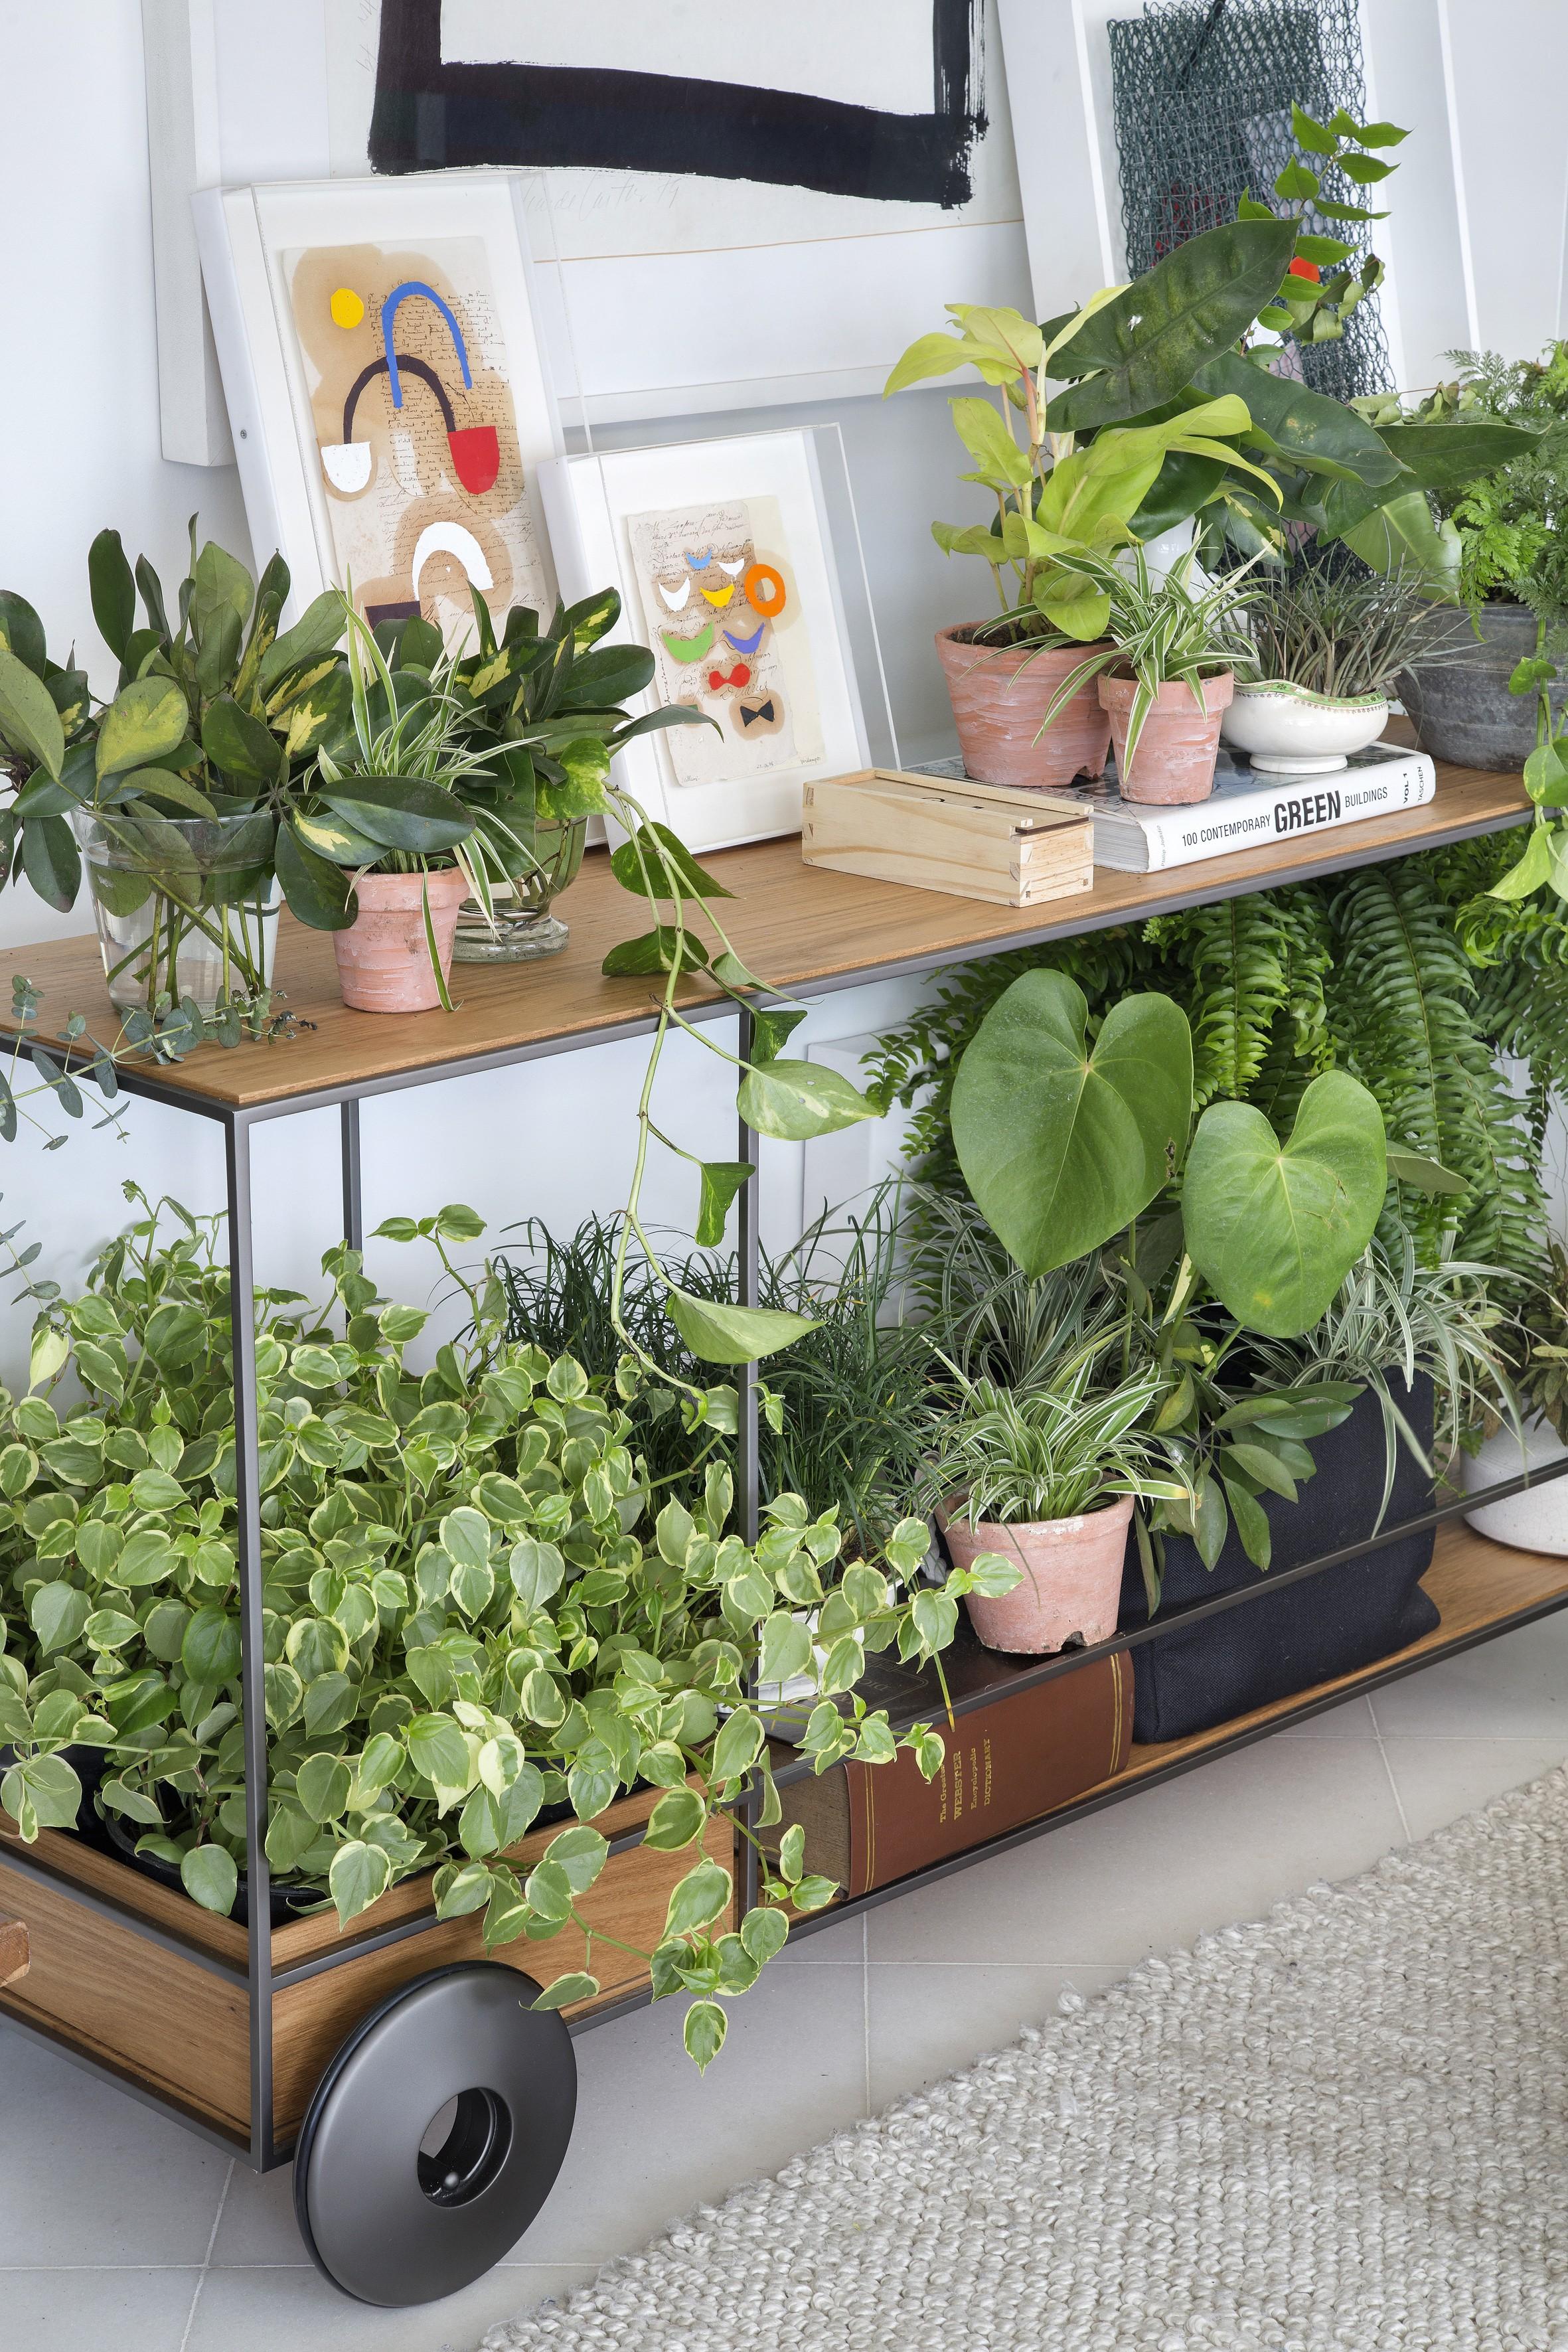 Folhagens para jardim: inspire-se no estilo de Burle Marx (Foto: Juliano Colodeti/ MCA Estúdio)